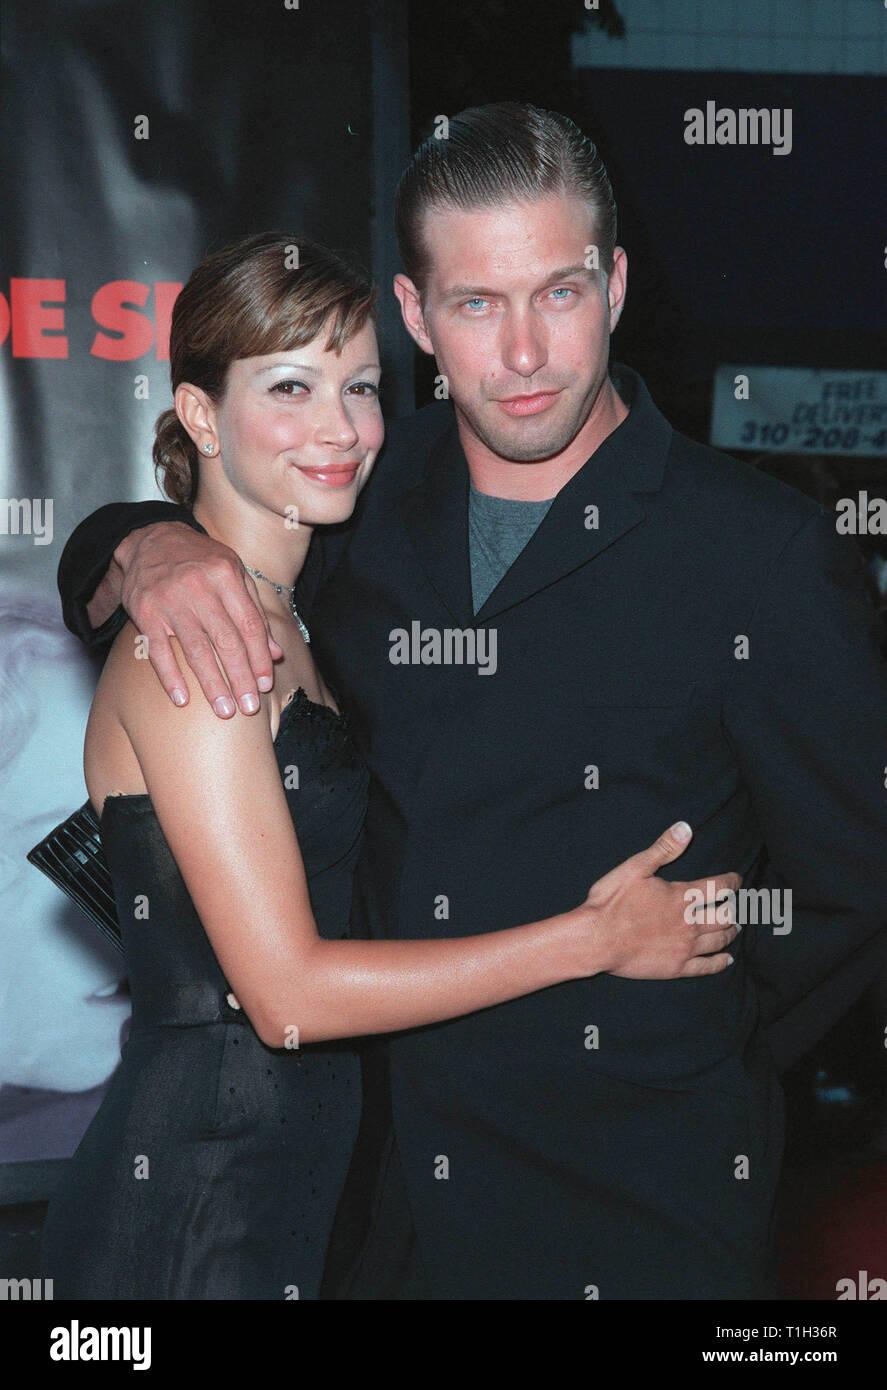 LOS ANGELES, CA  July 13, 1999: Actor STEPHEN BALDWIN & wife